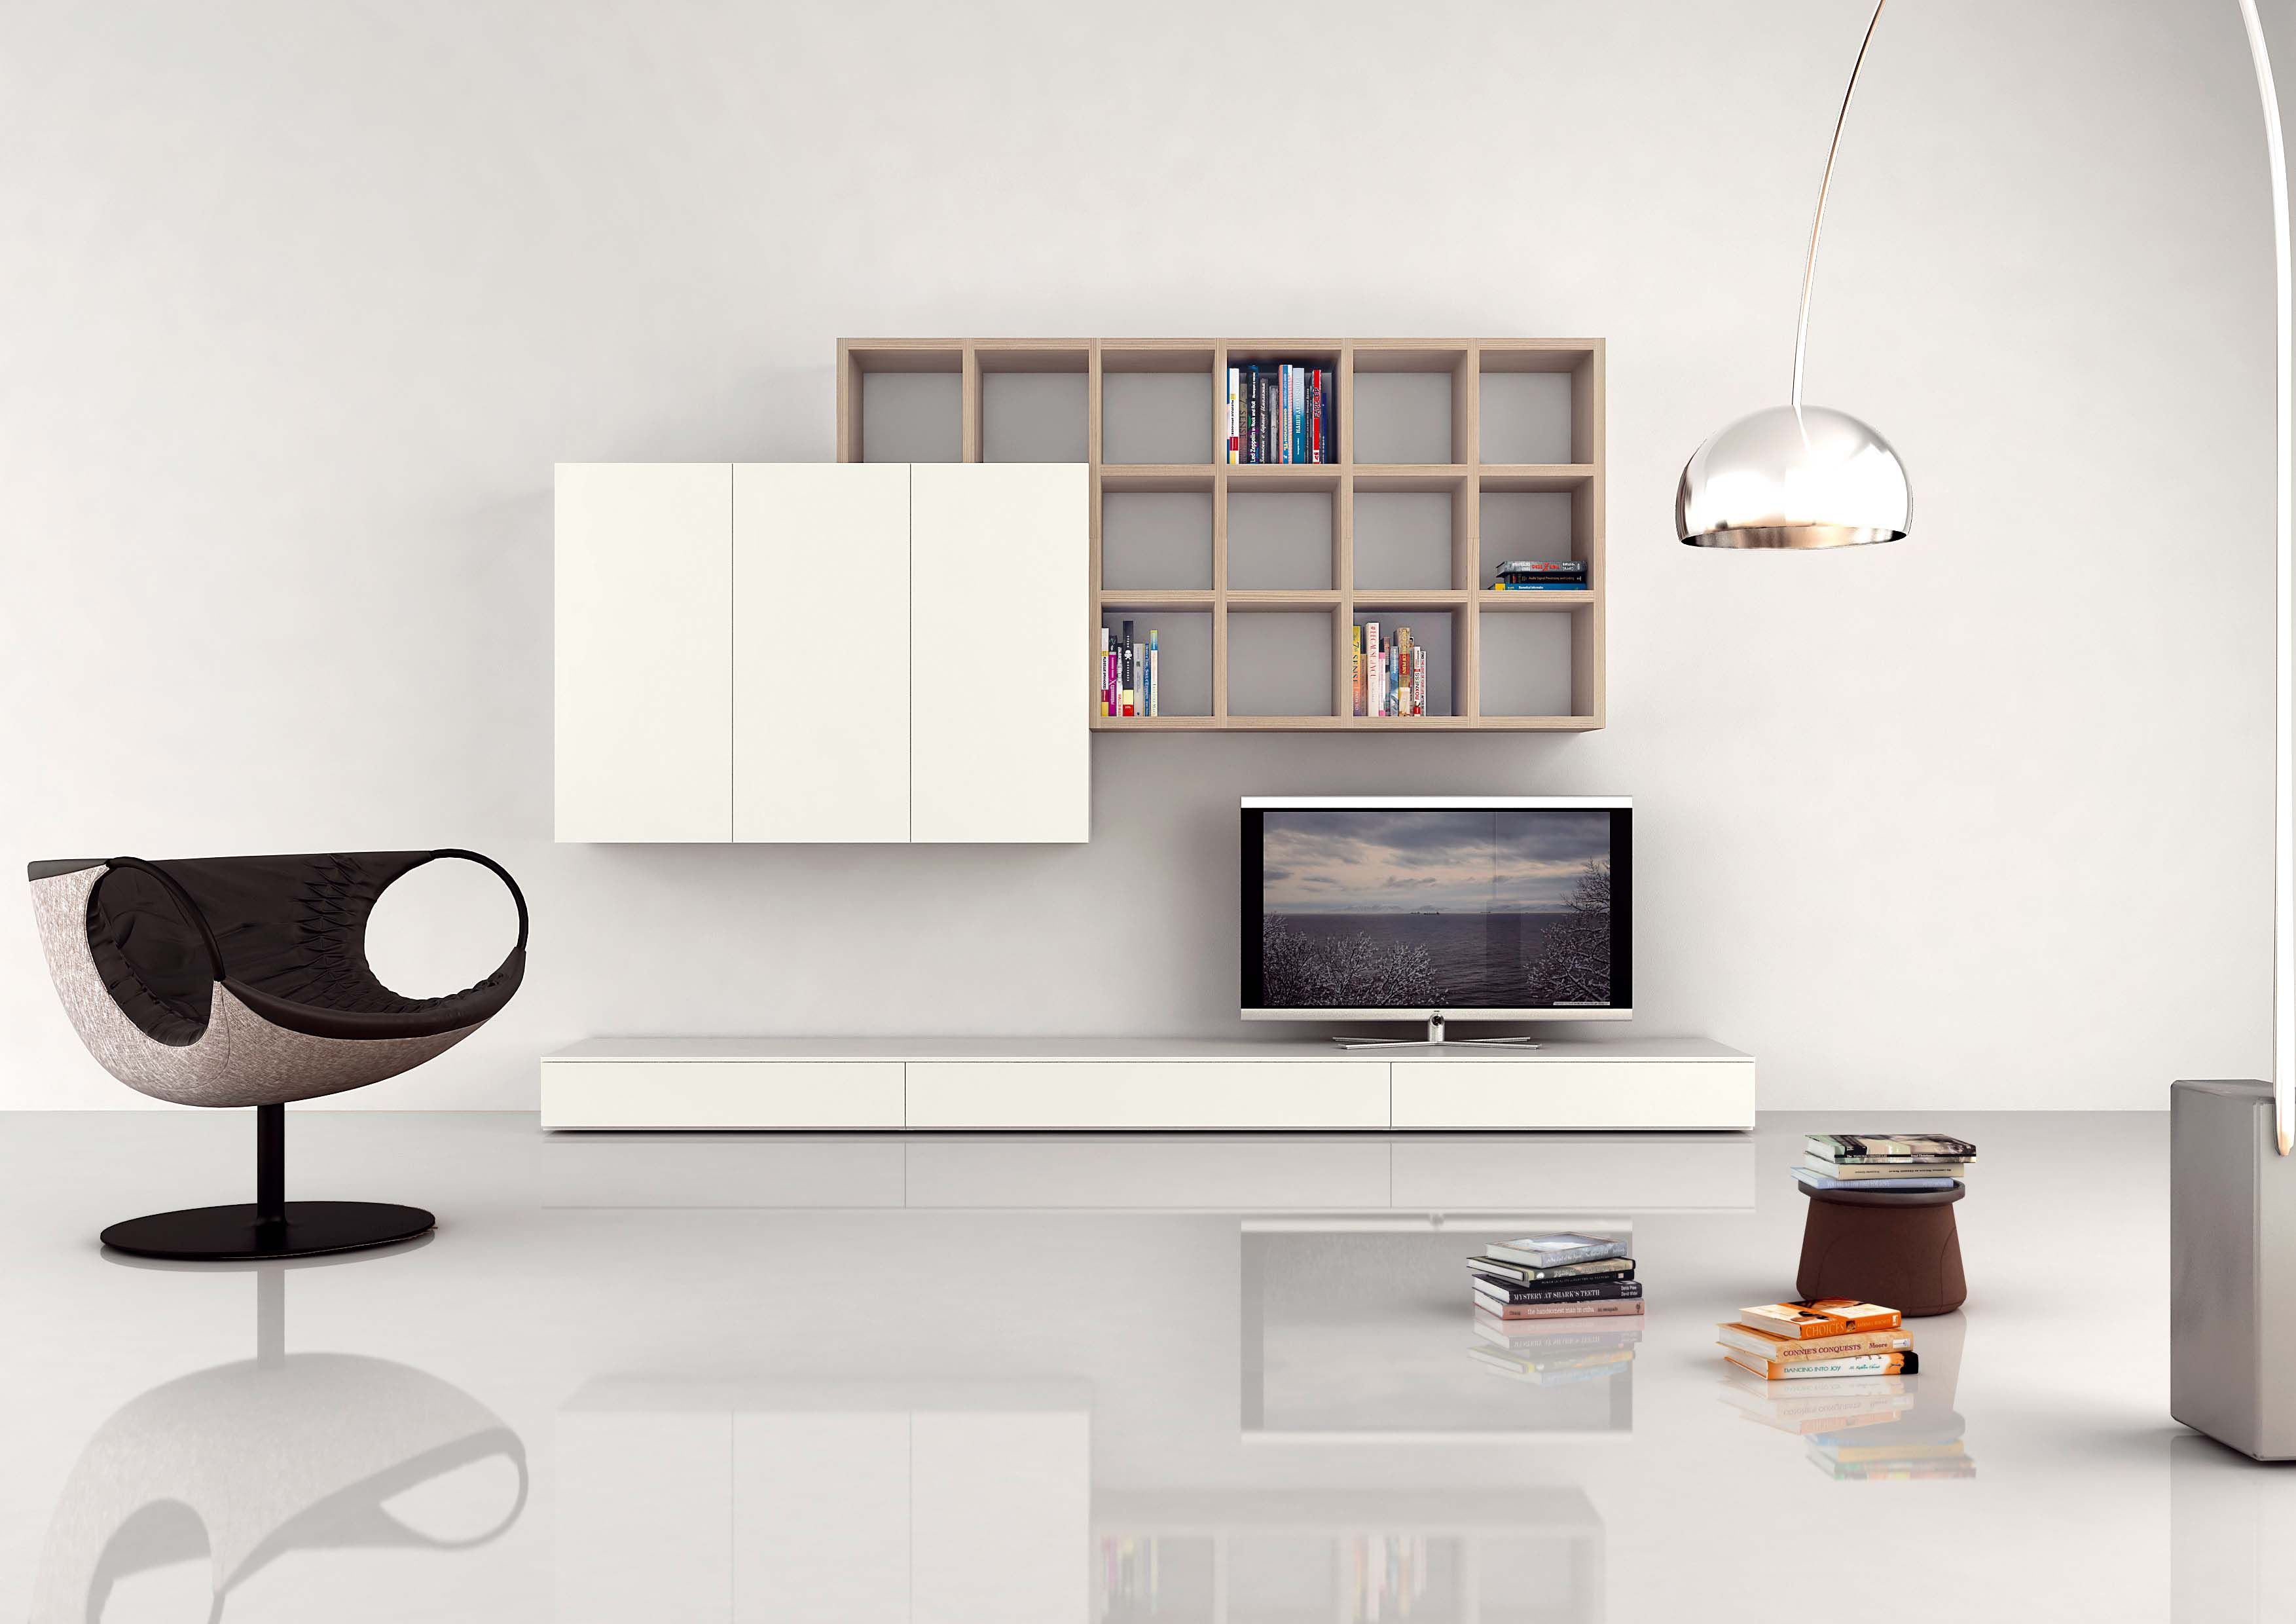 moderne wohnzimmer | wohnzimmer modern wohnzimmer im modernen stil ...